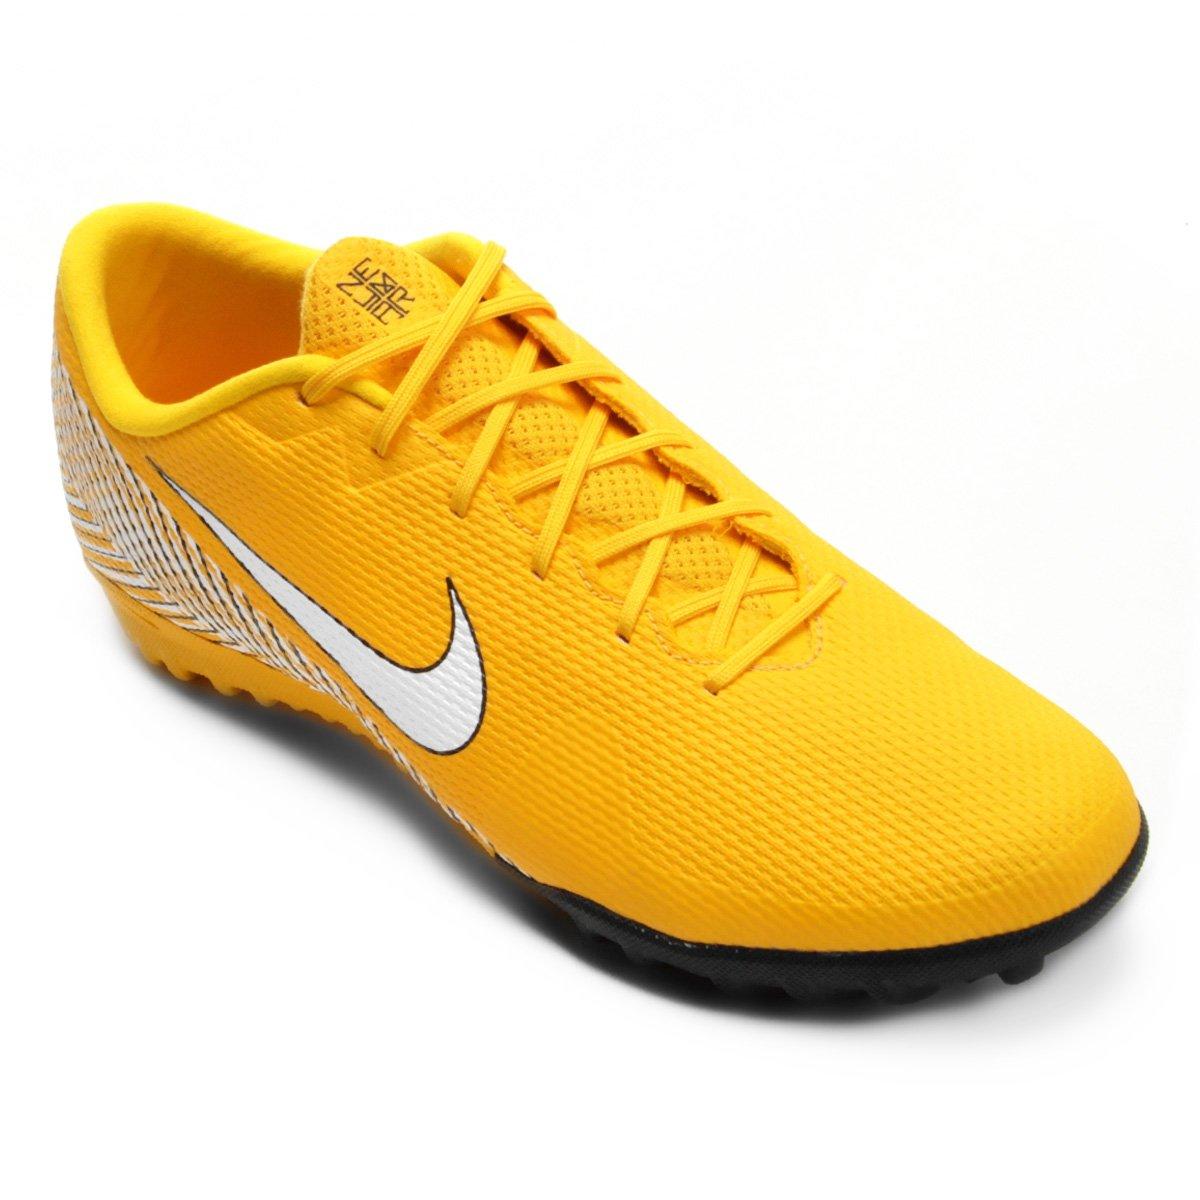 5b261b203d Chuteira Society Nike Mercurial Vapor 12 Academy Neymar TF - Amarelo e  Preto